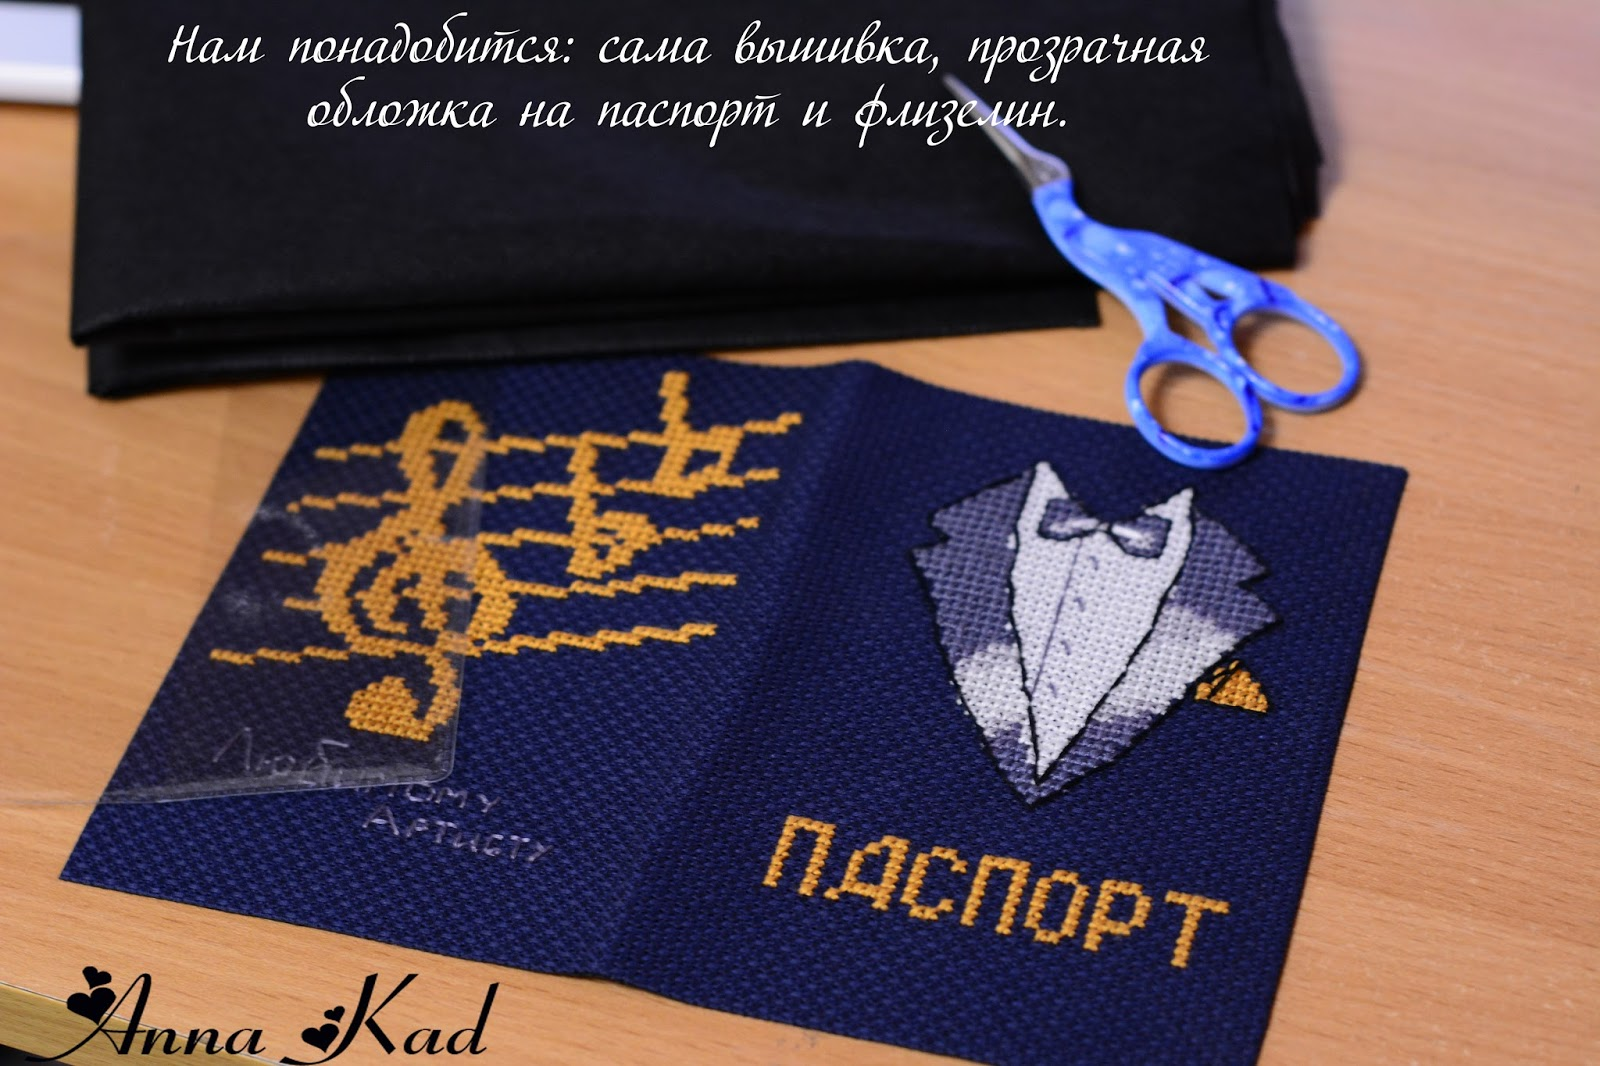 Мастер класс по вышивке анна